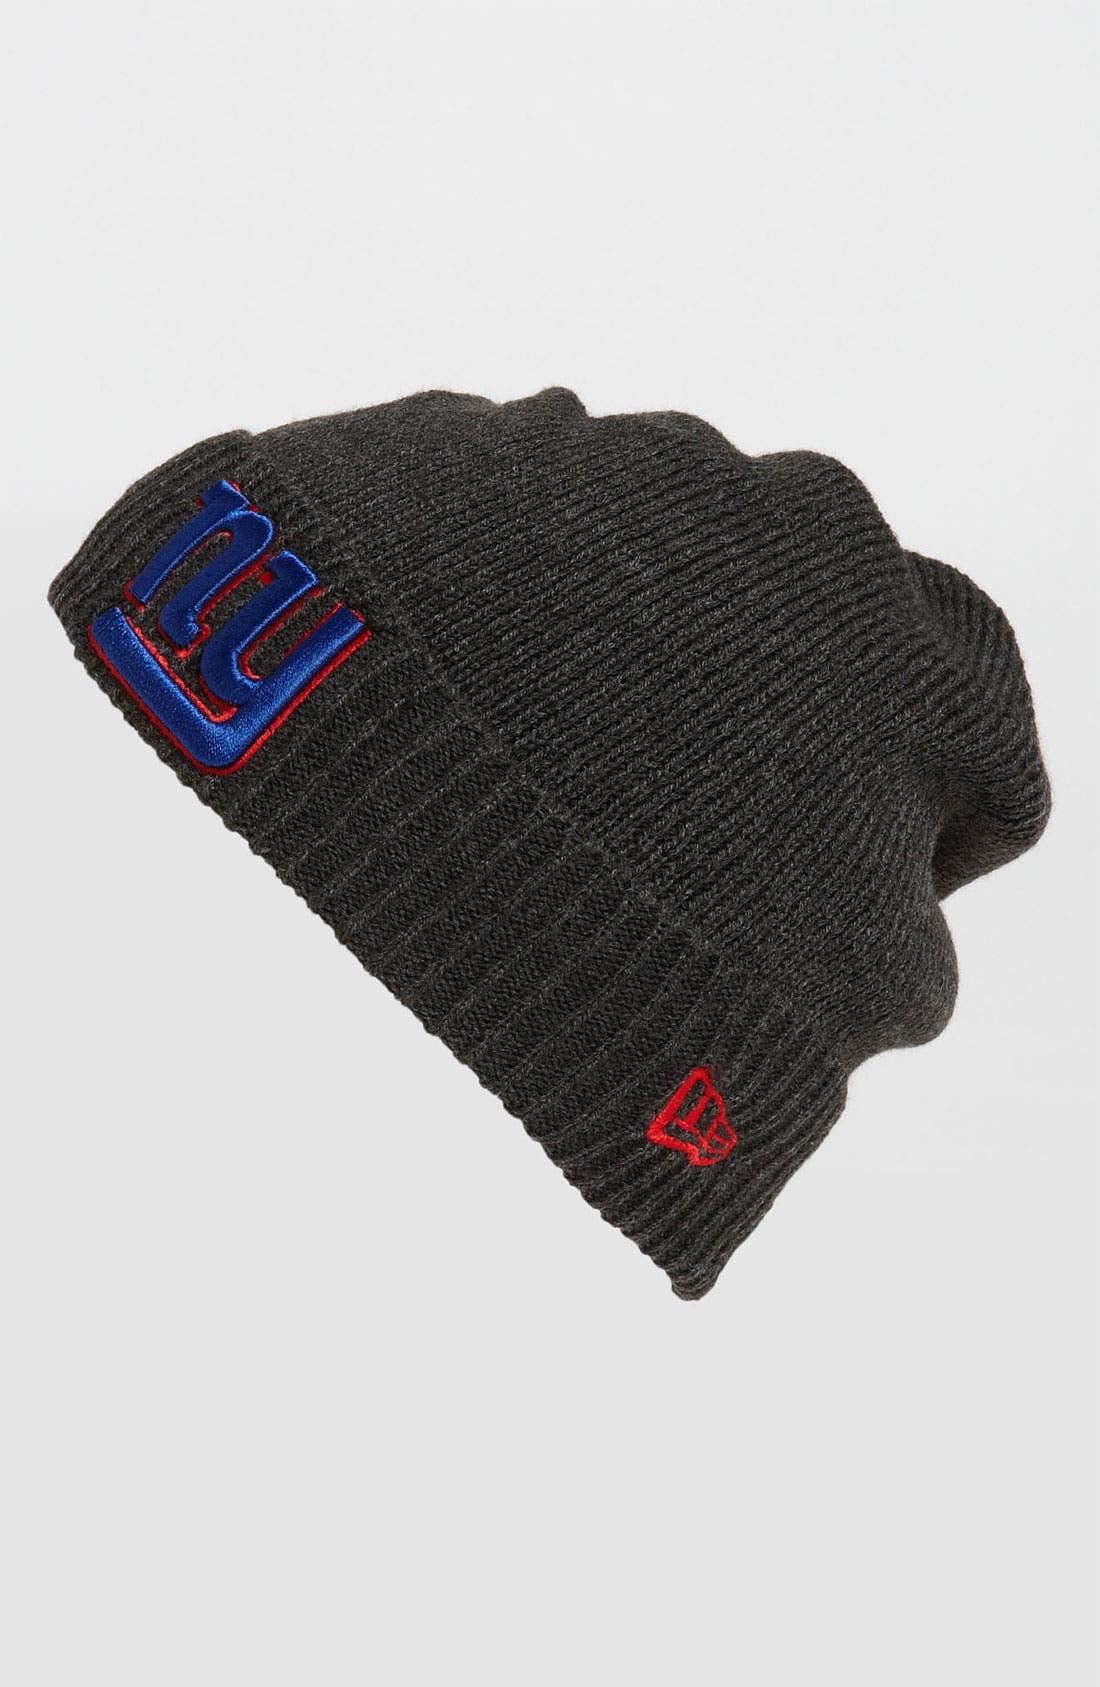 Alternate Image 1 Selected - New Era Cap 'New York Giants' Thermal Beanie